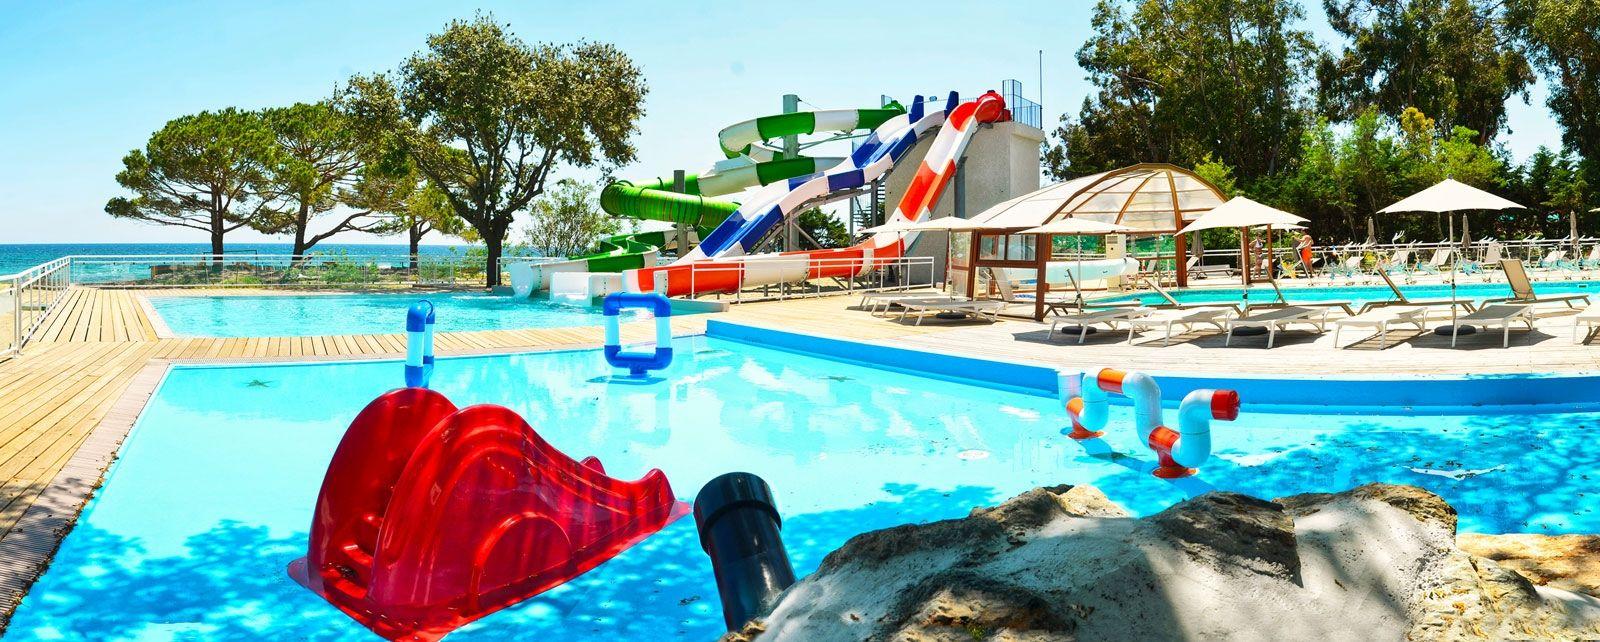 Camping Merendella - Moriani Plage